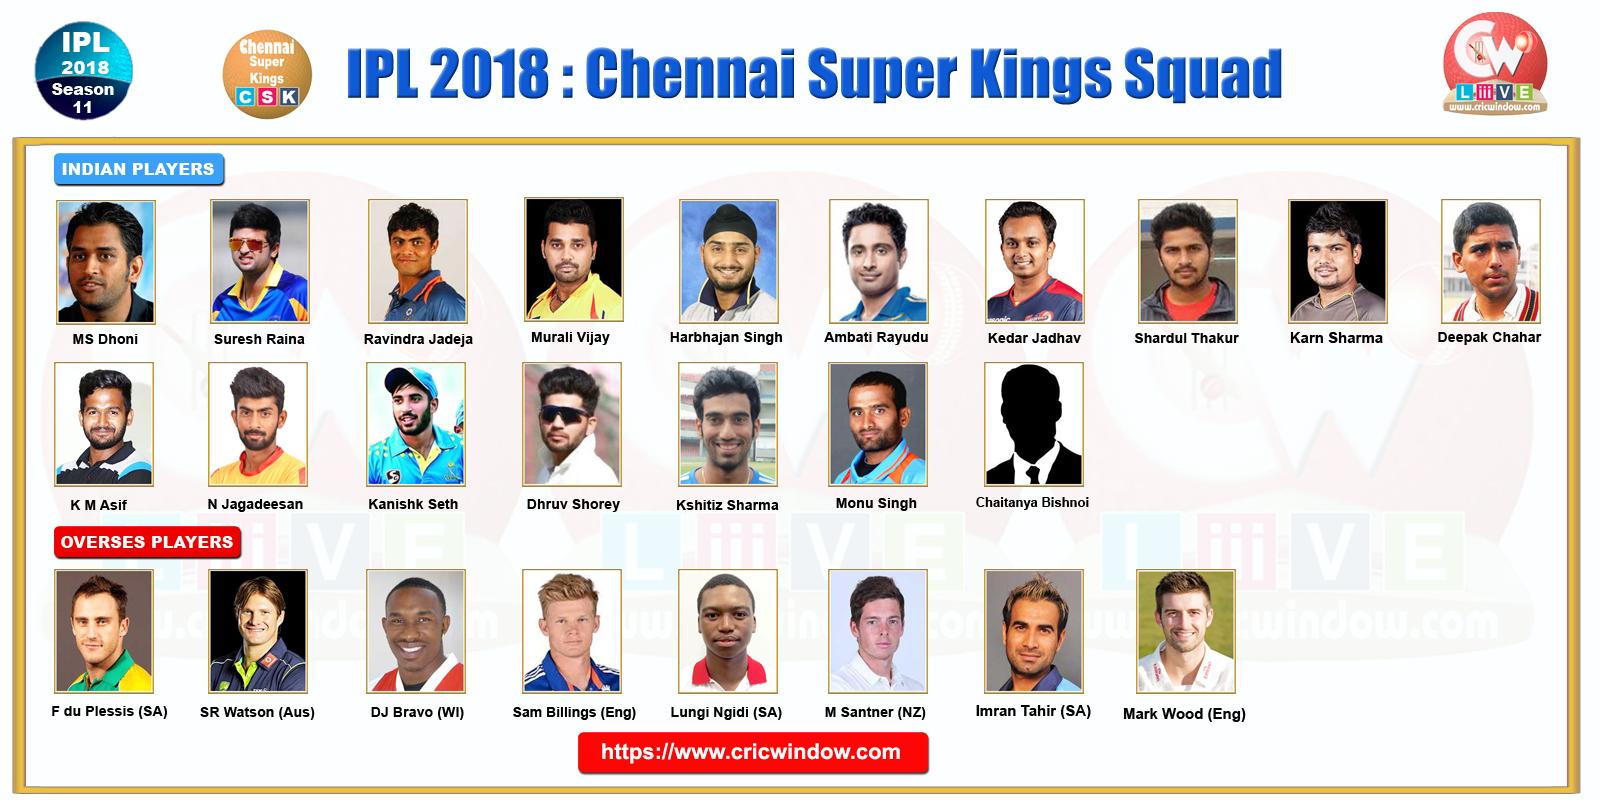 ipl 11 csk squad chennai super kings players list 2018